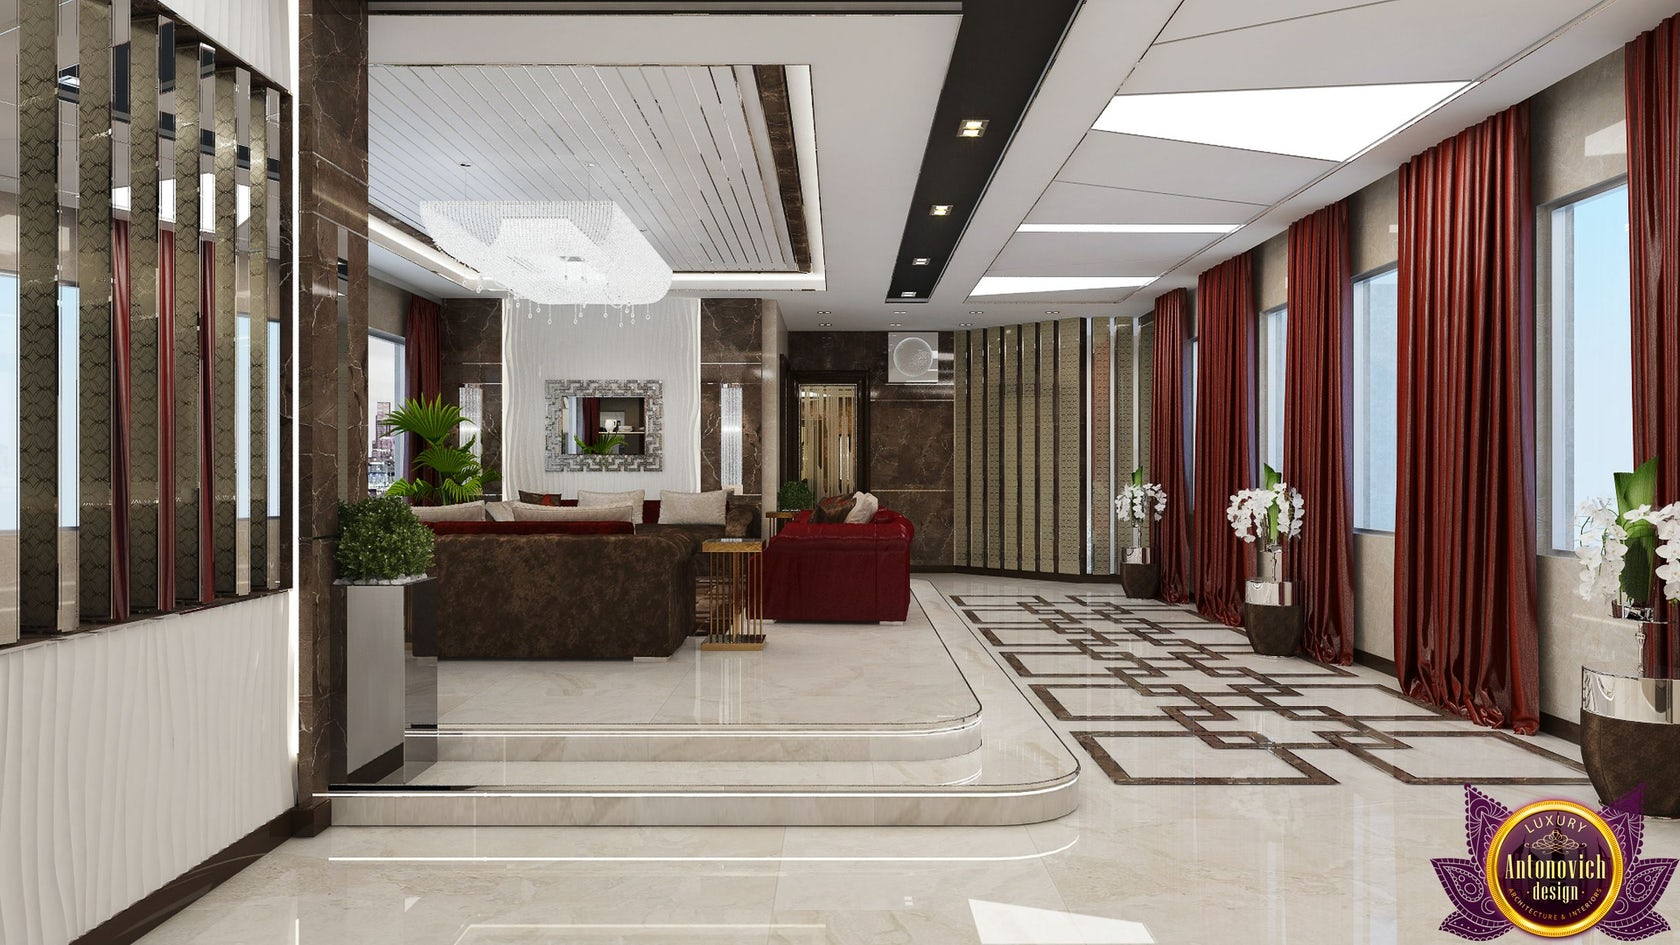 Kitchen Design Usa By Katrina Antonovich: Modern Living Room Interior Of Katrina Antonovich